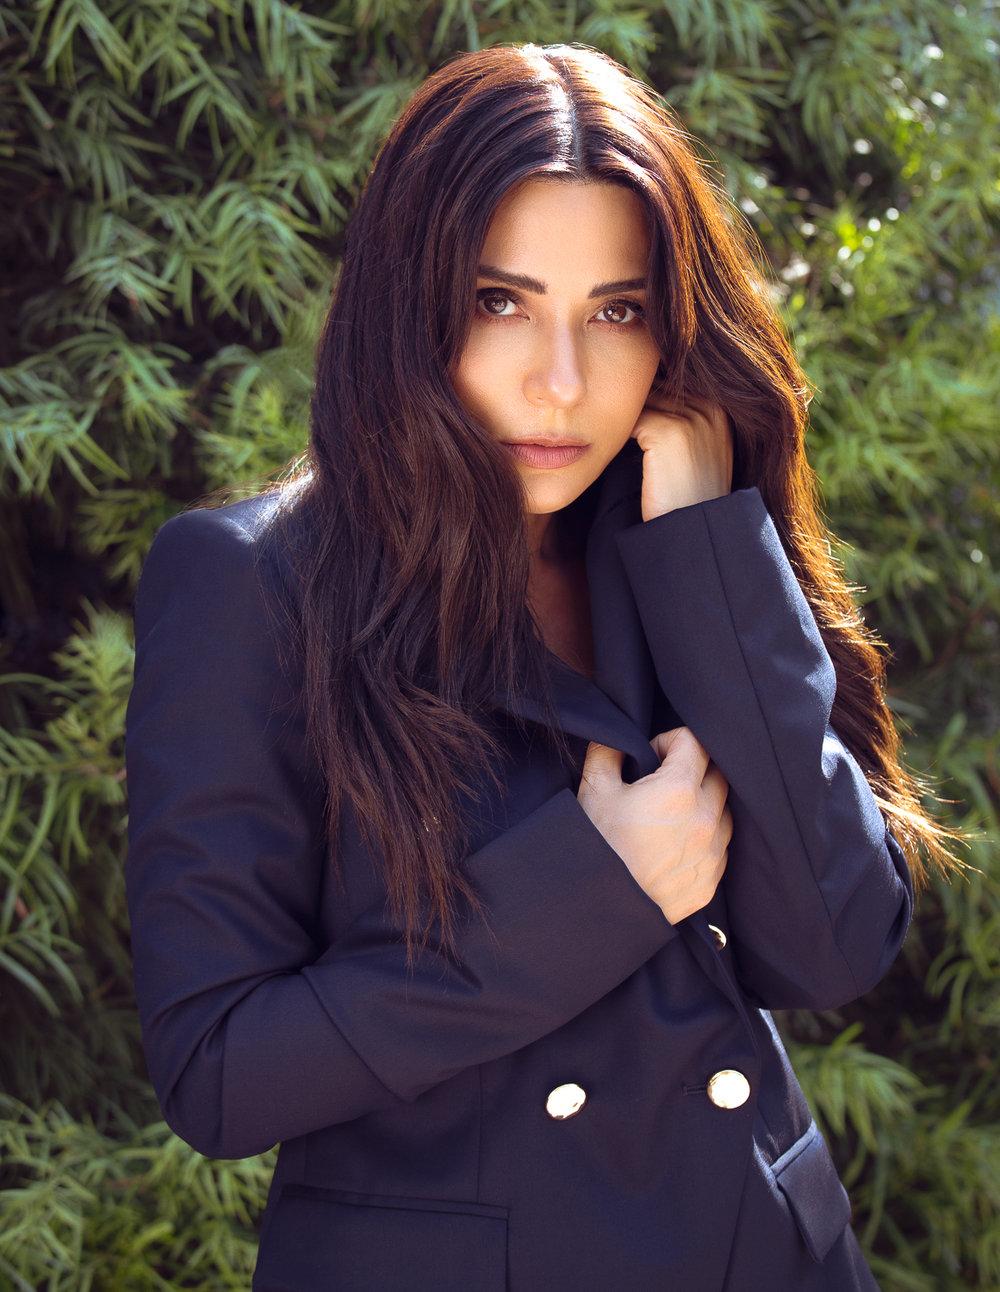 Marisol Nichols (Riverdale, 24)